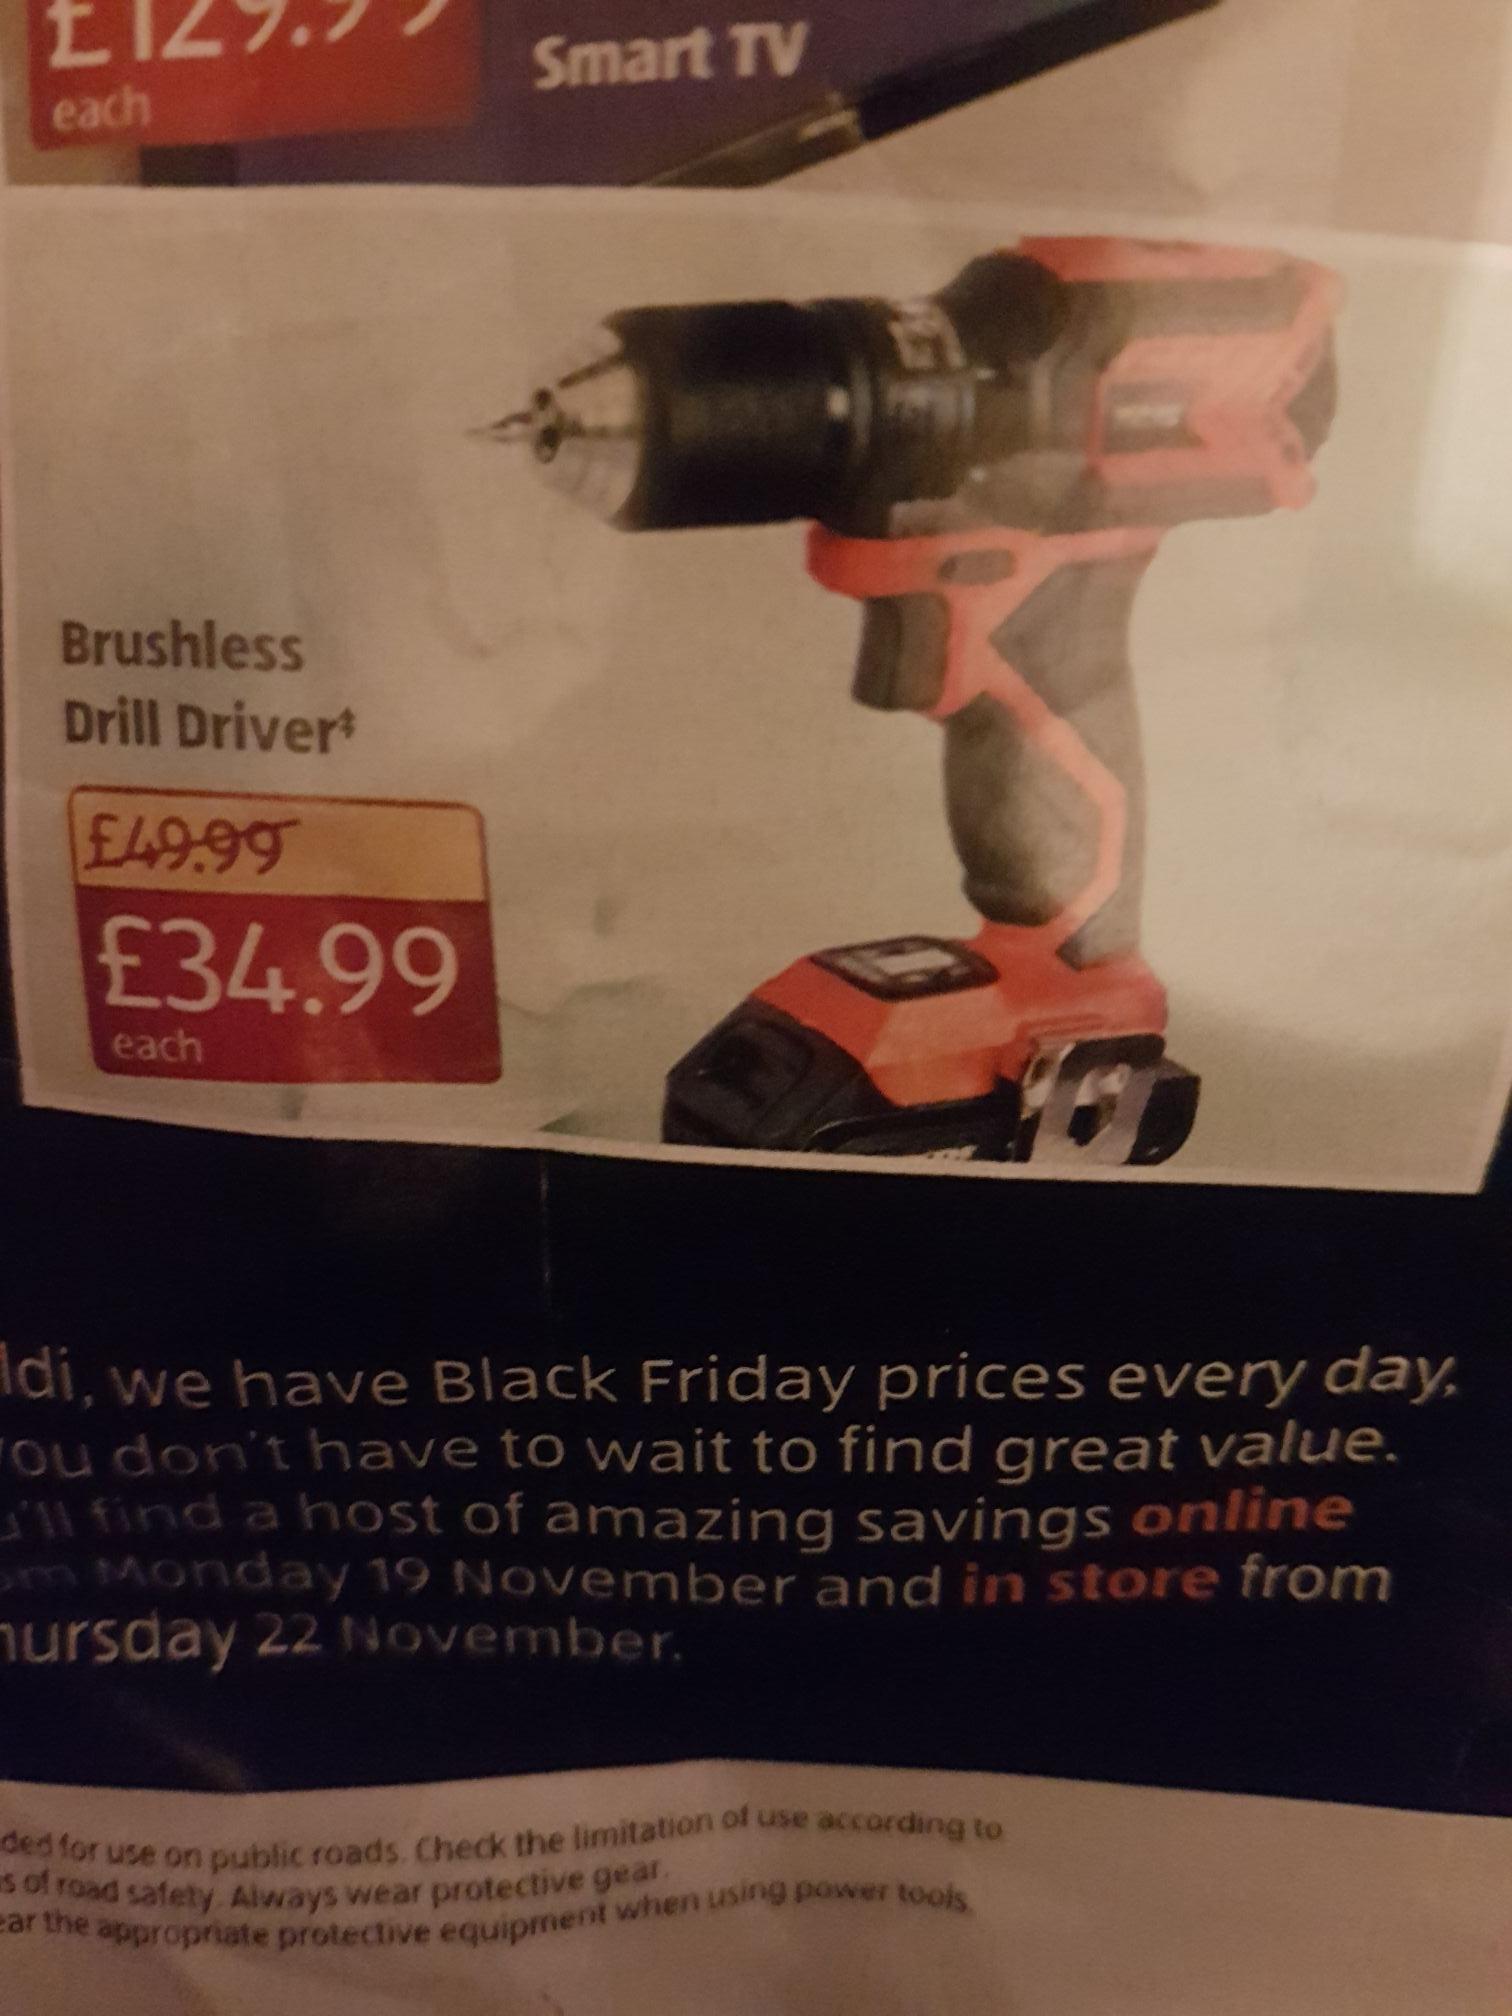 Workzone 18v brushless drill driver £34.99 @ Aldi